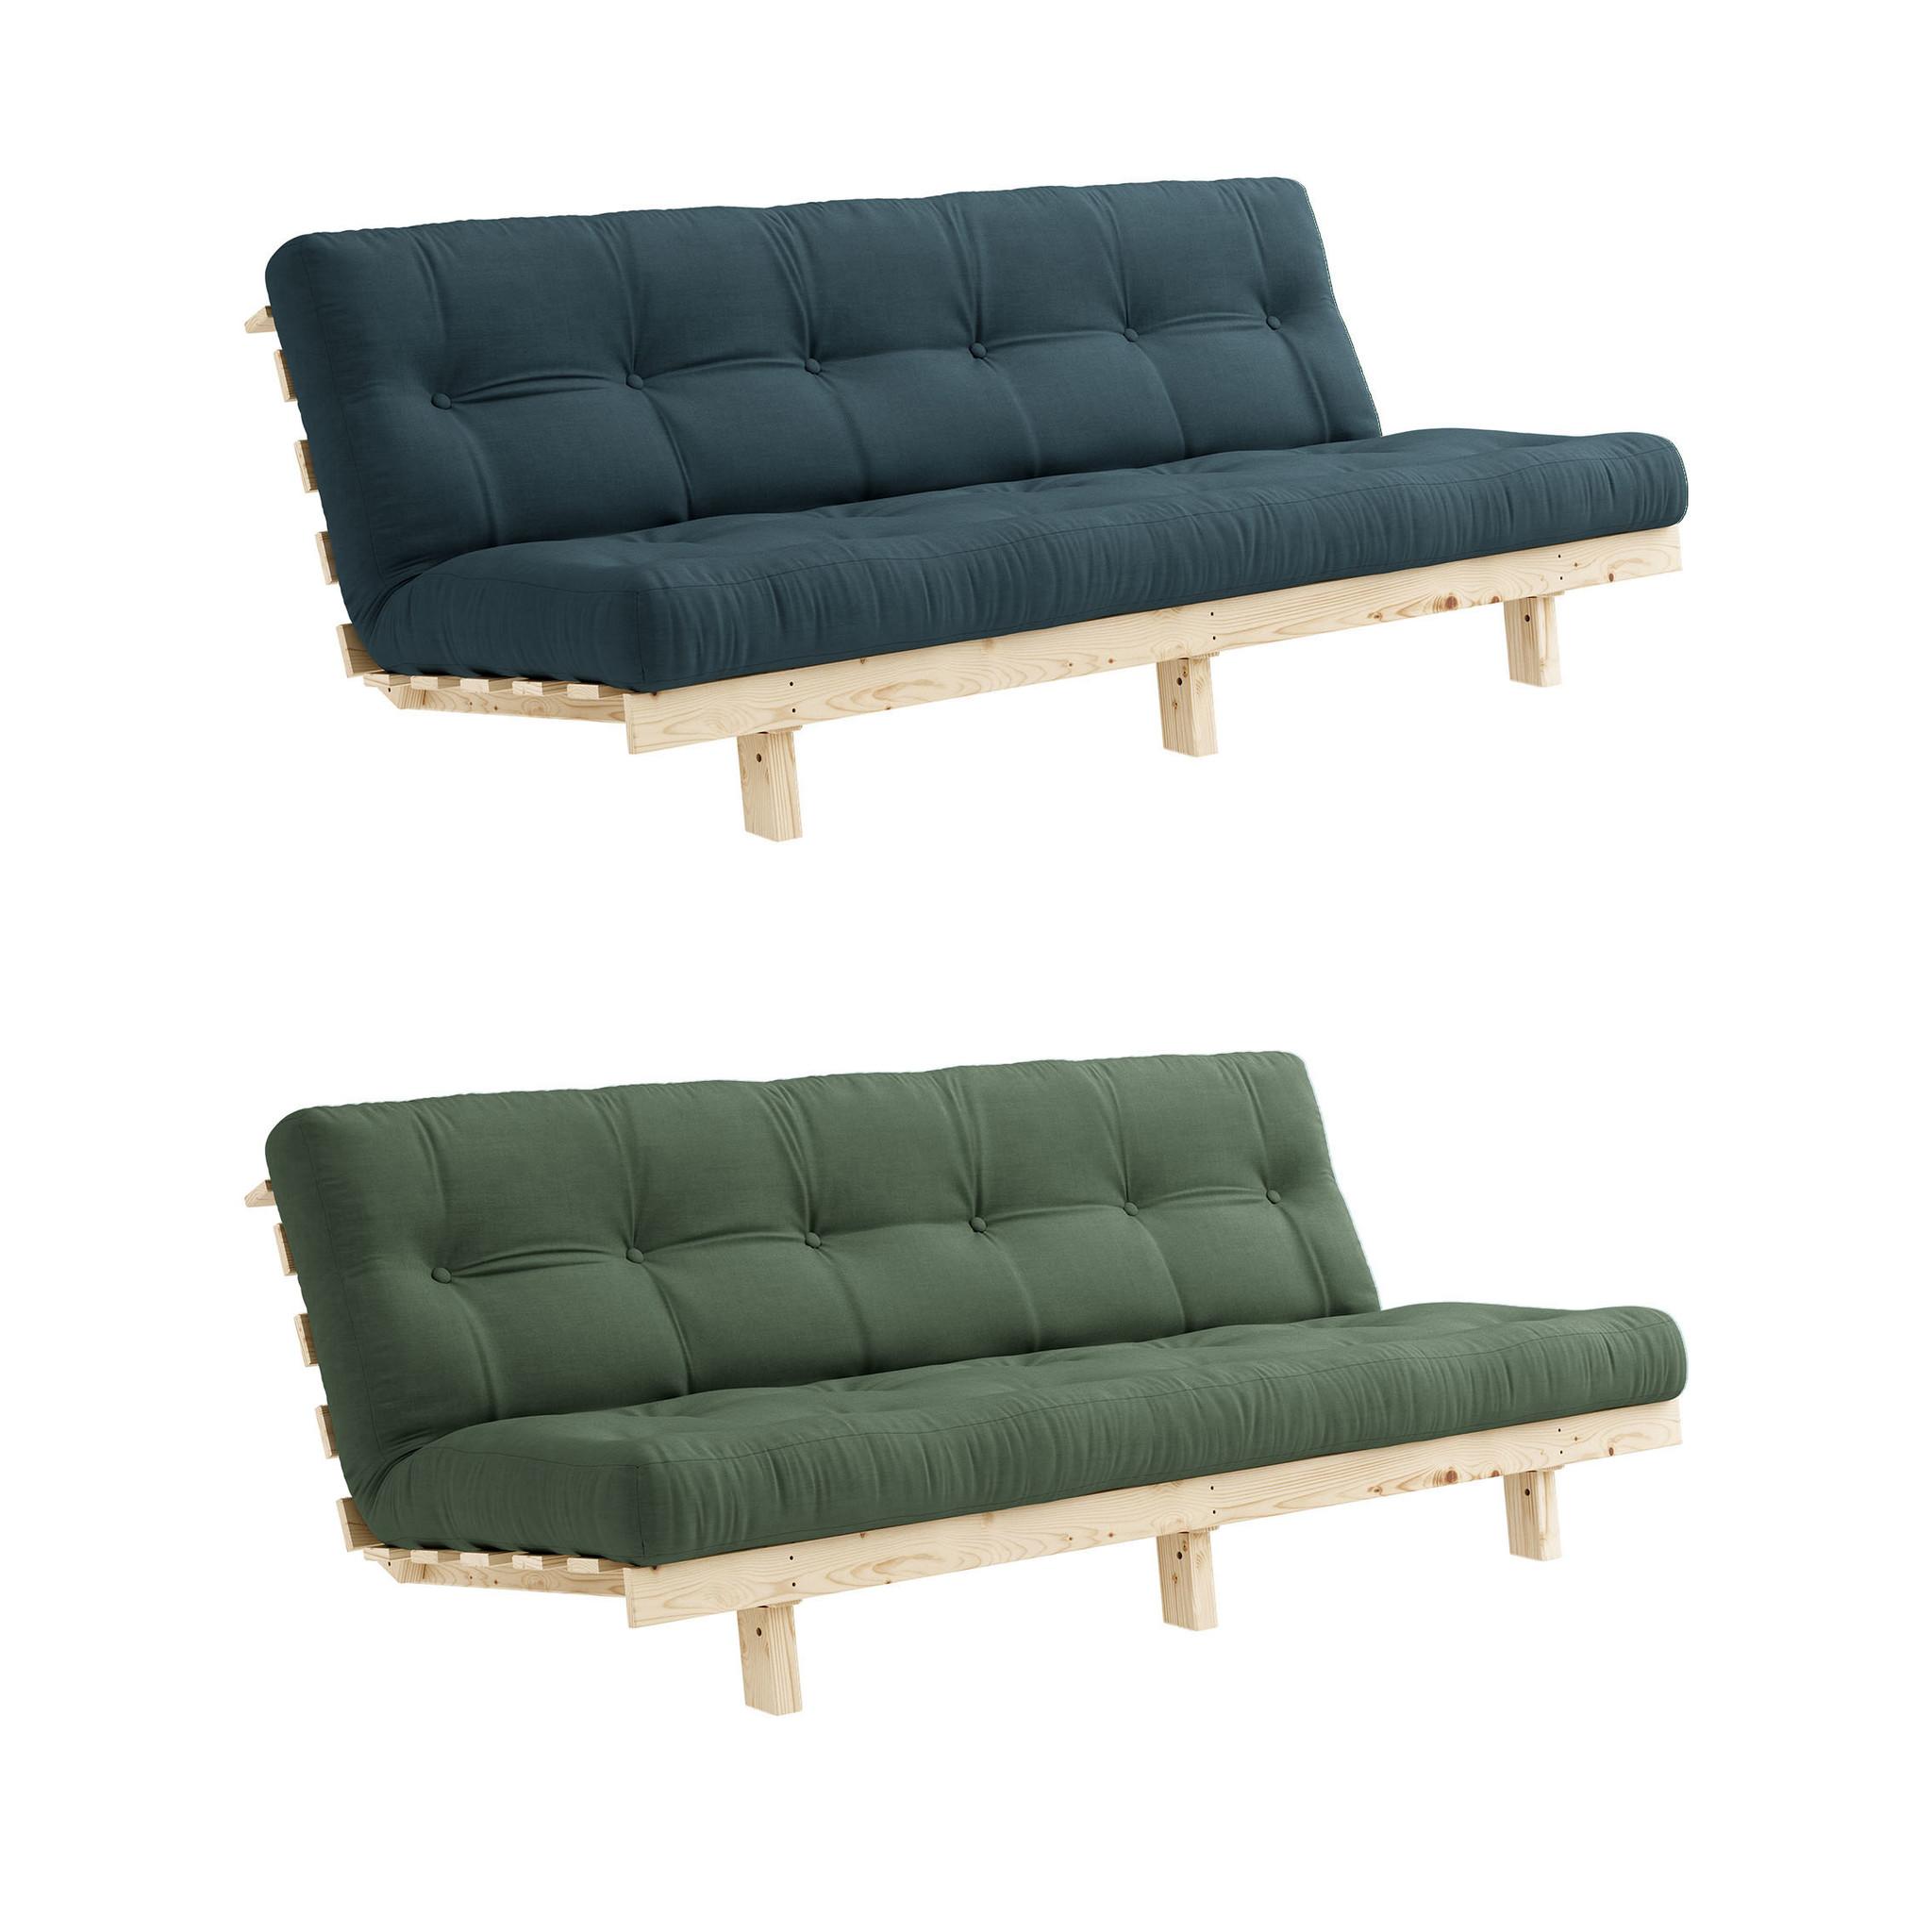 Karup Design Lean Sofa bed